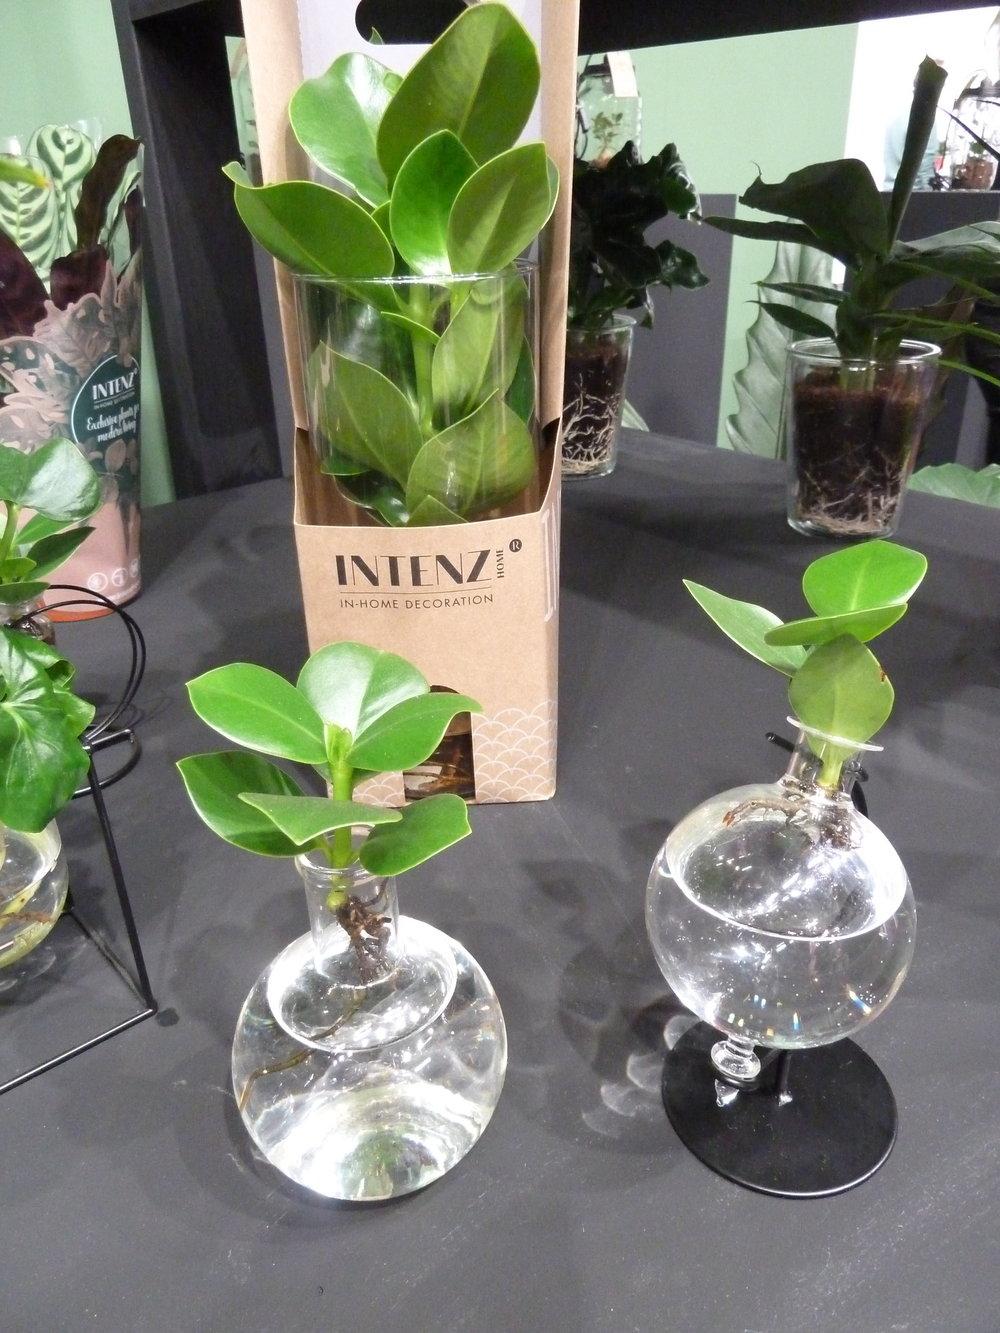 Water cultured ZZ plants